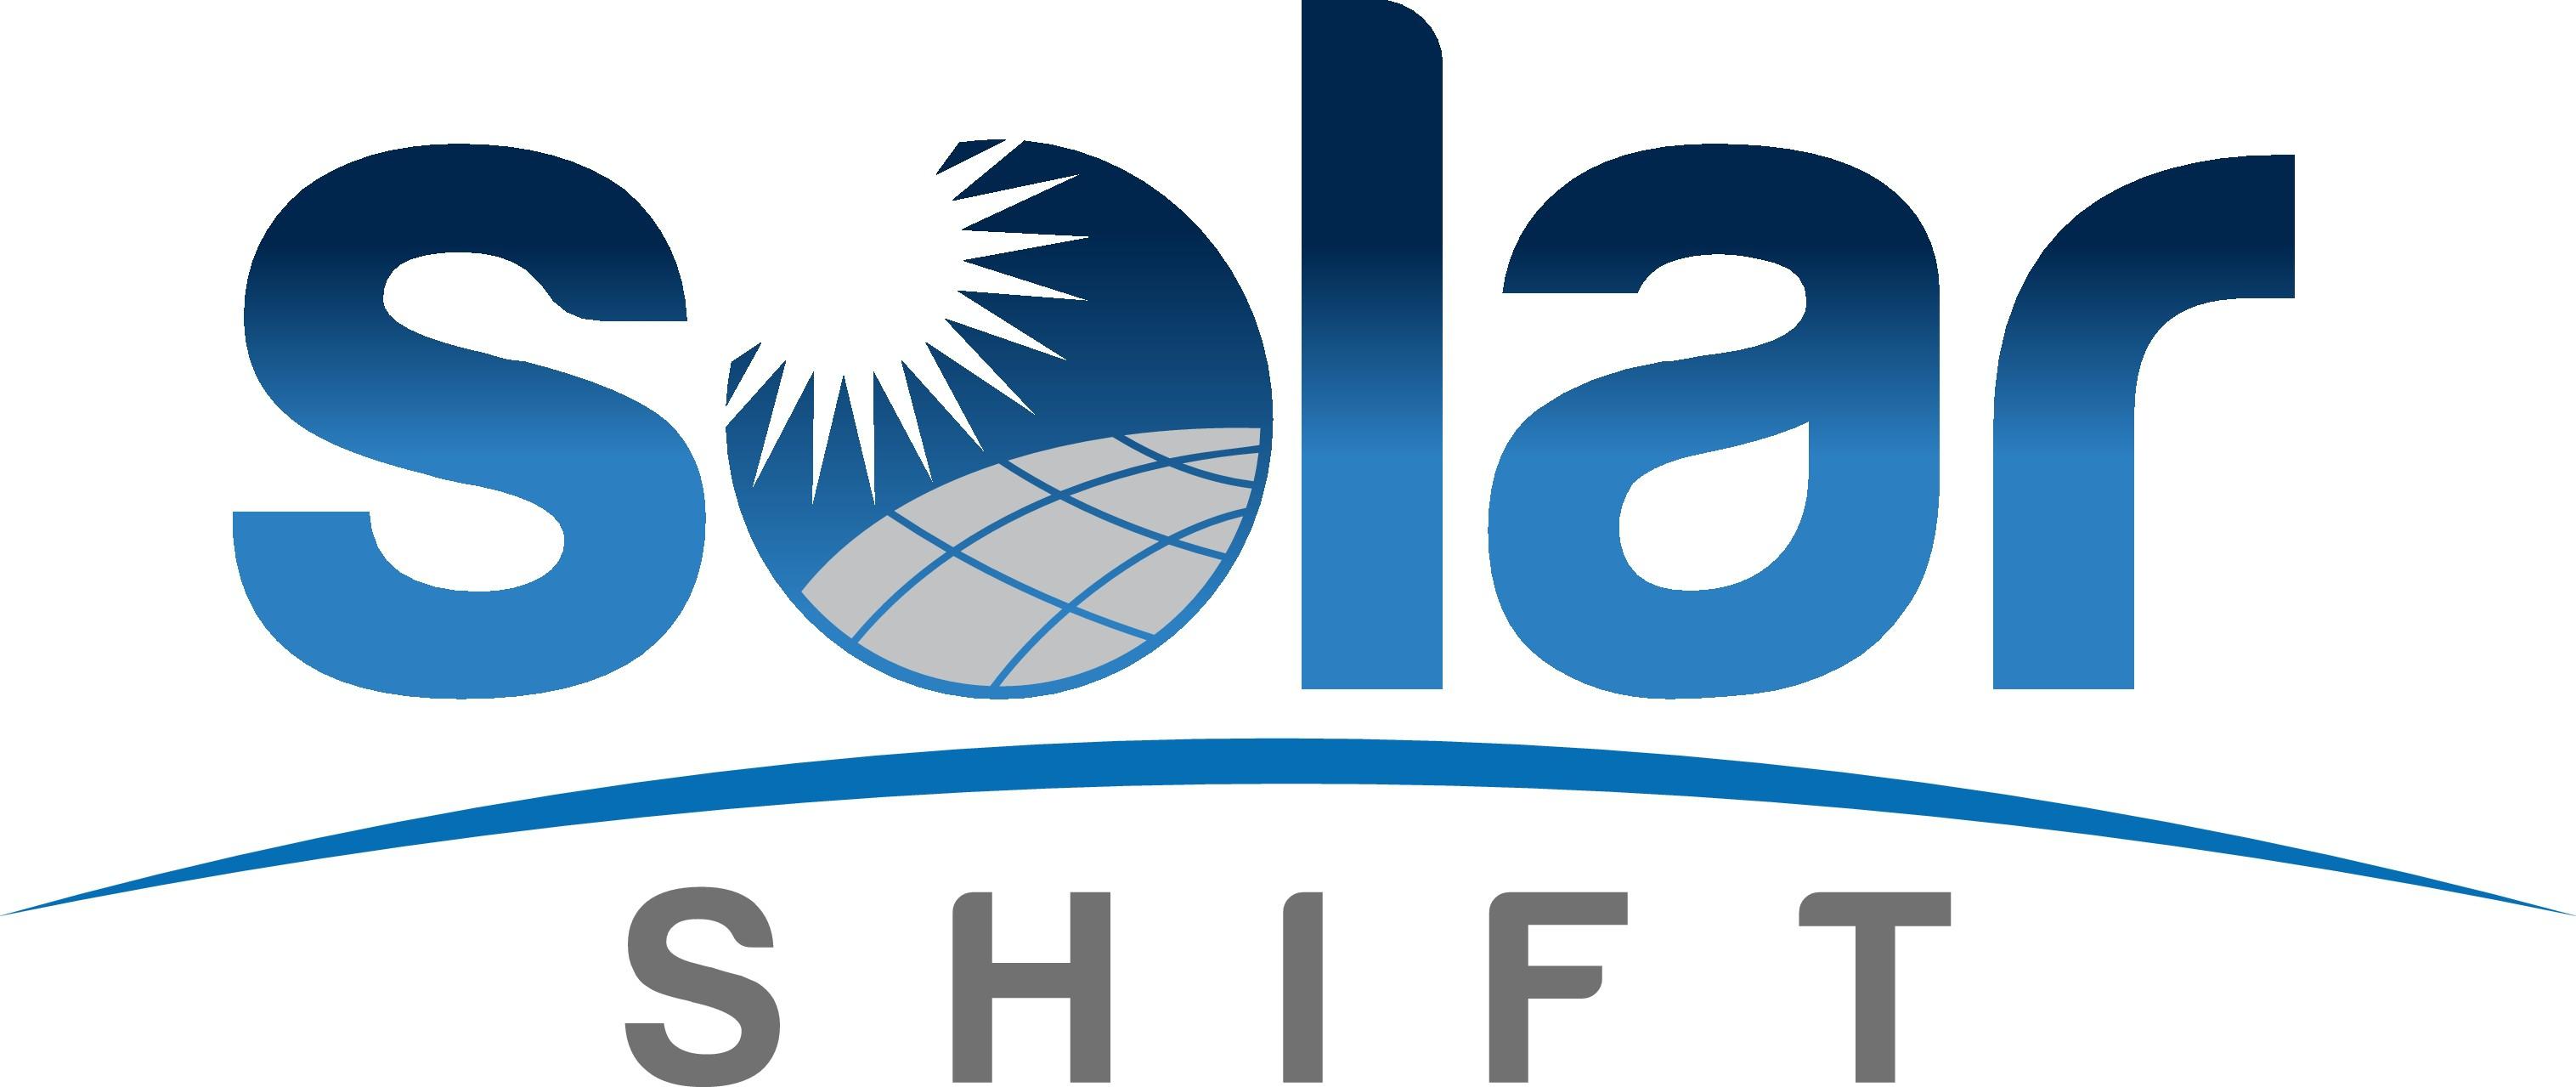 Create a modern and organic design logo for a national Solar Developer